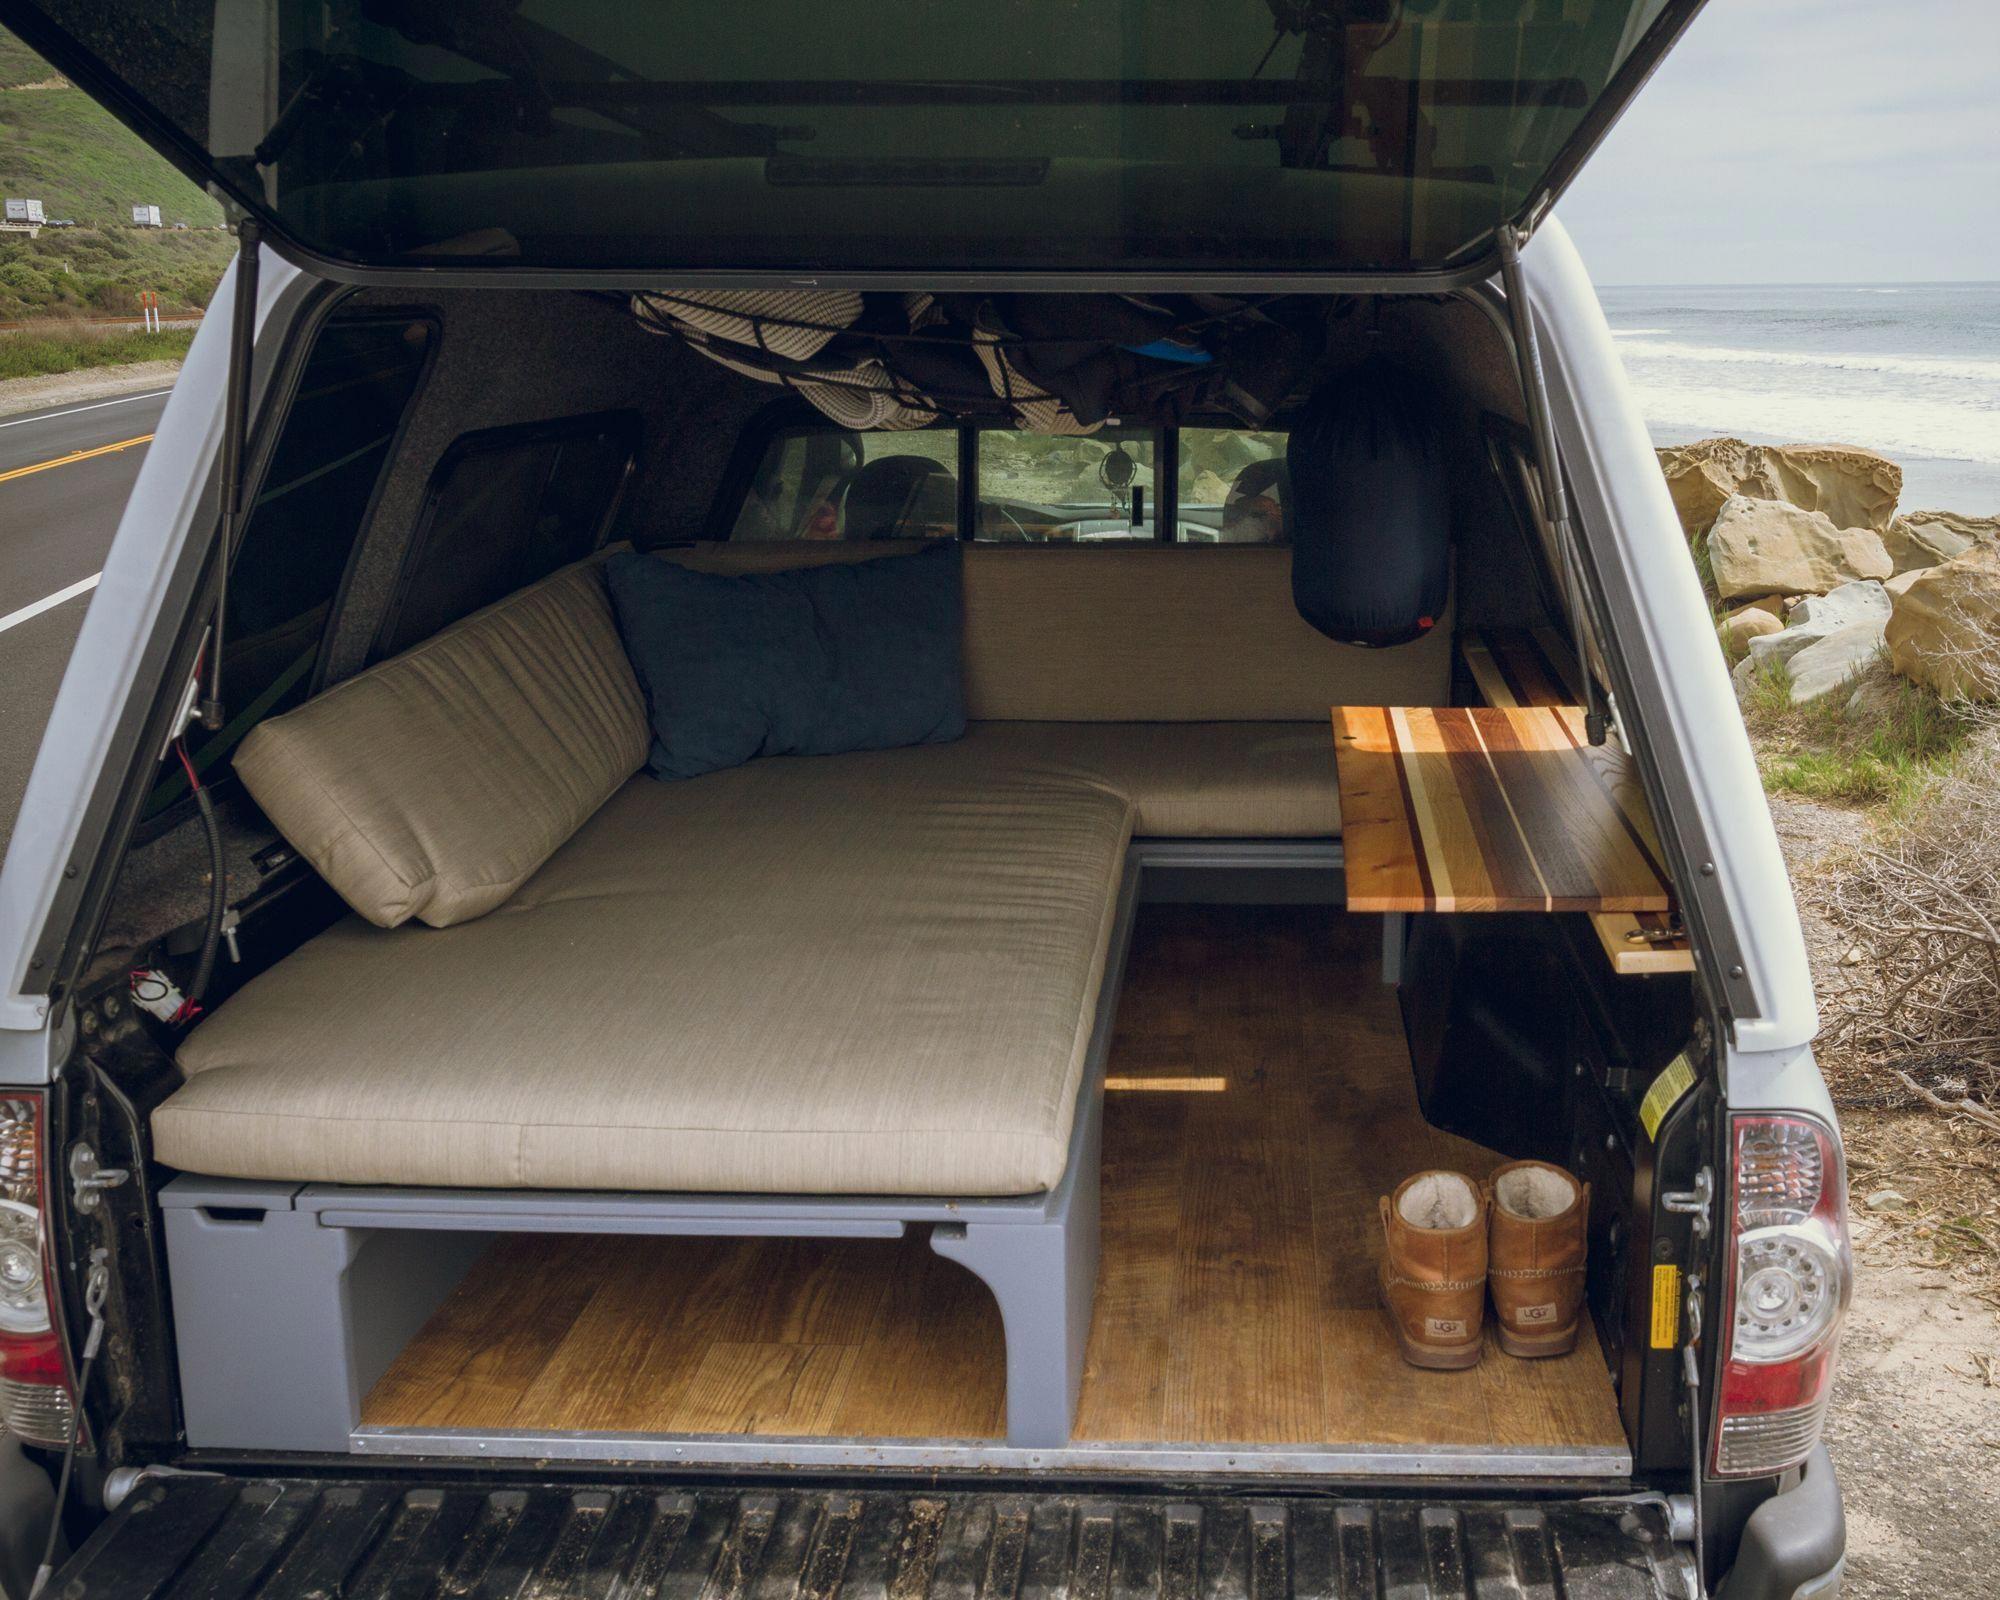 camper setup Truck bed camper, Truck bed camping